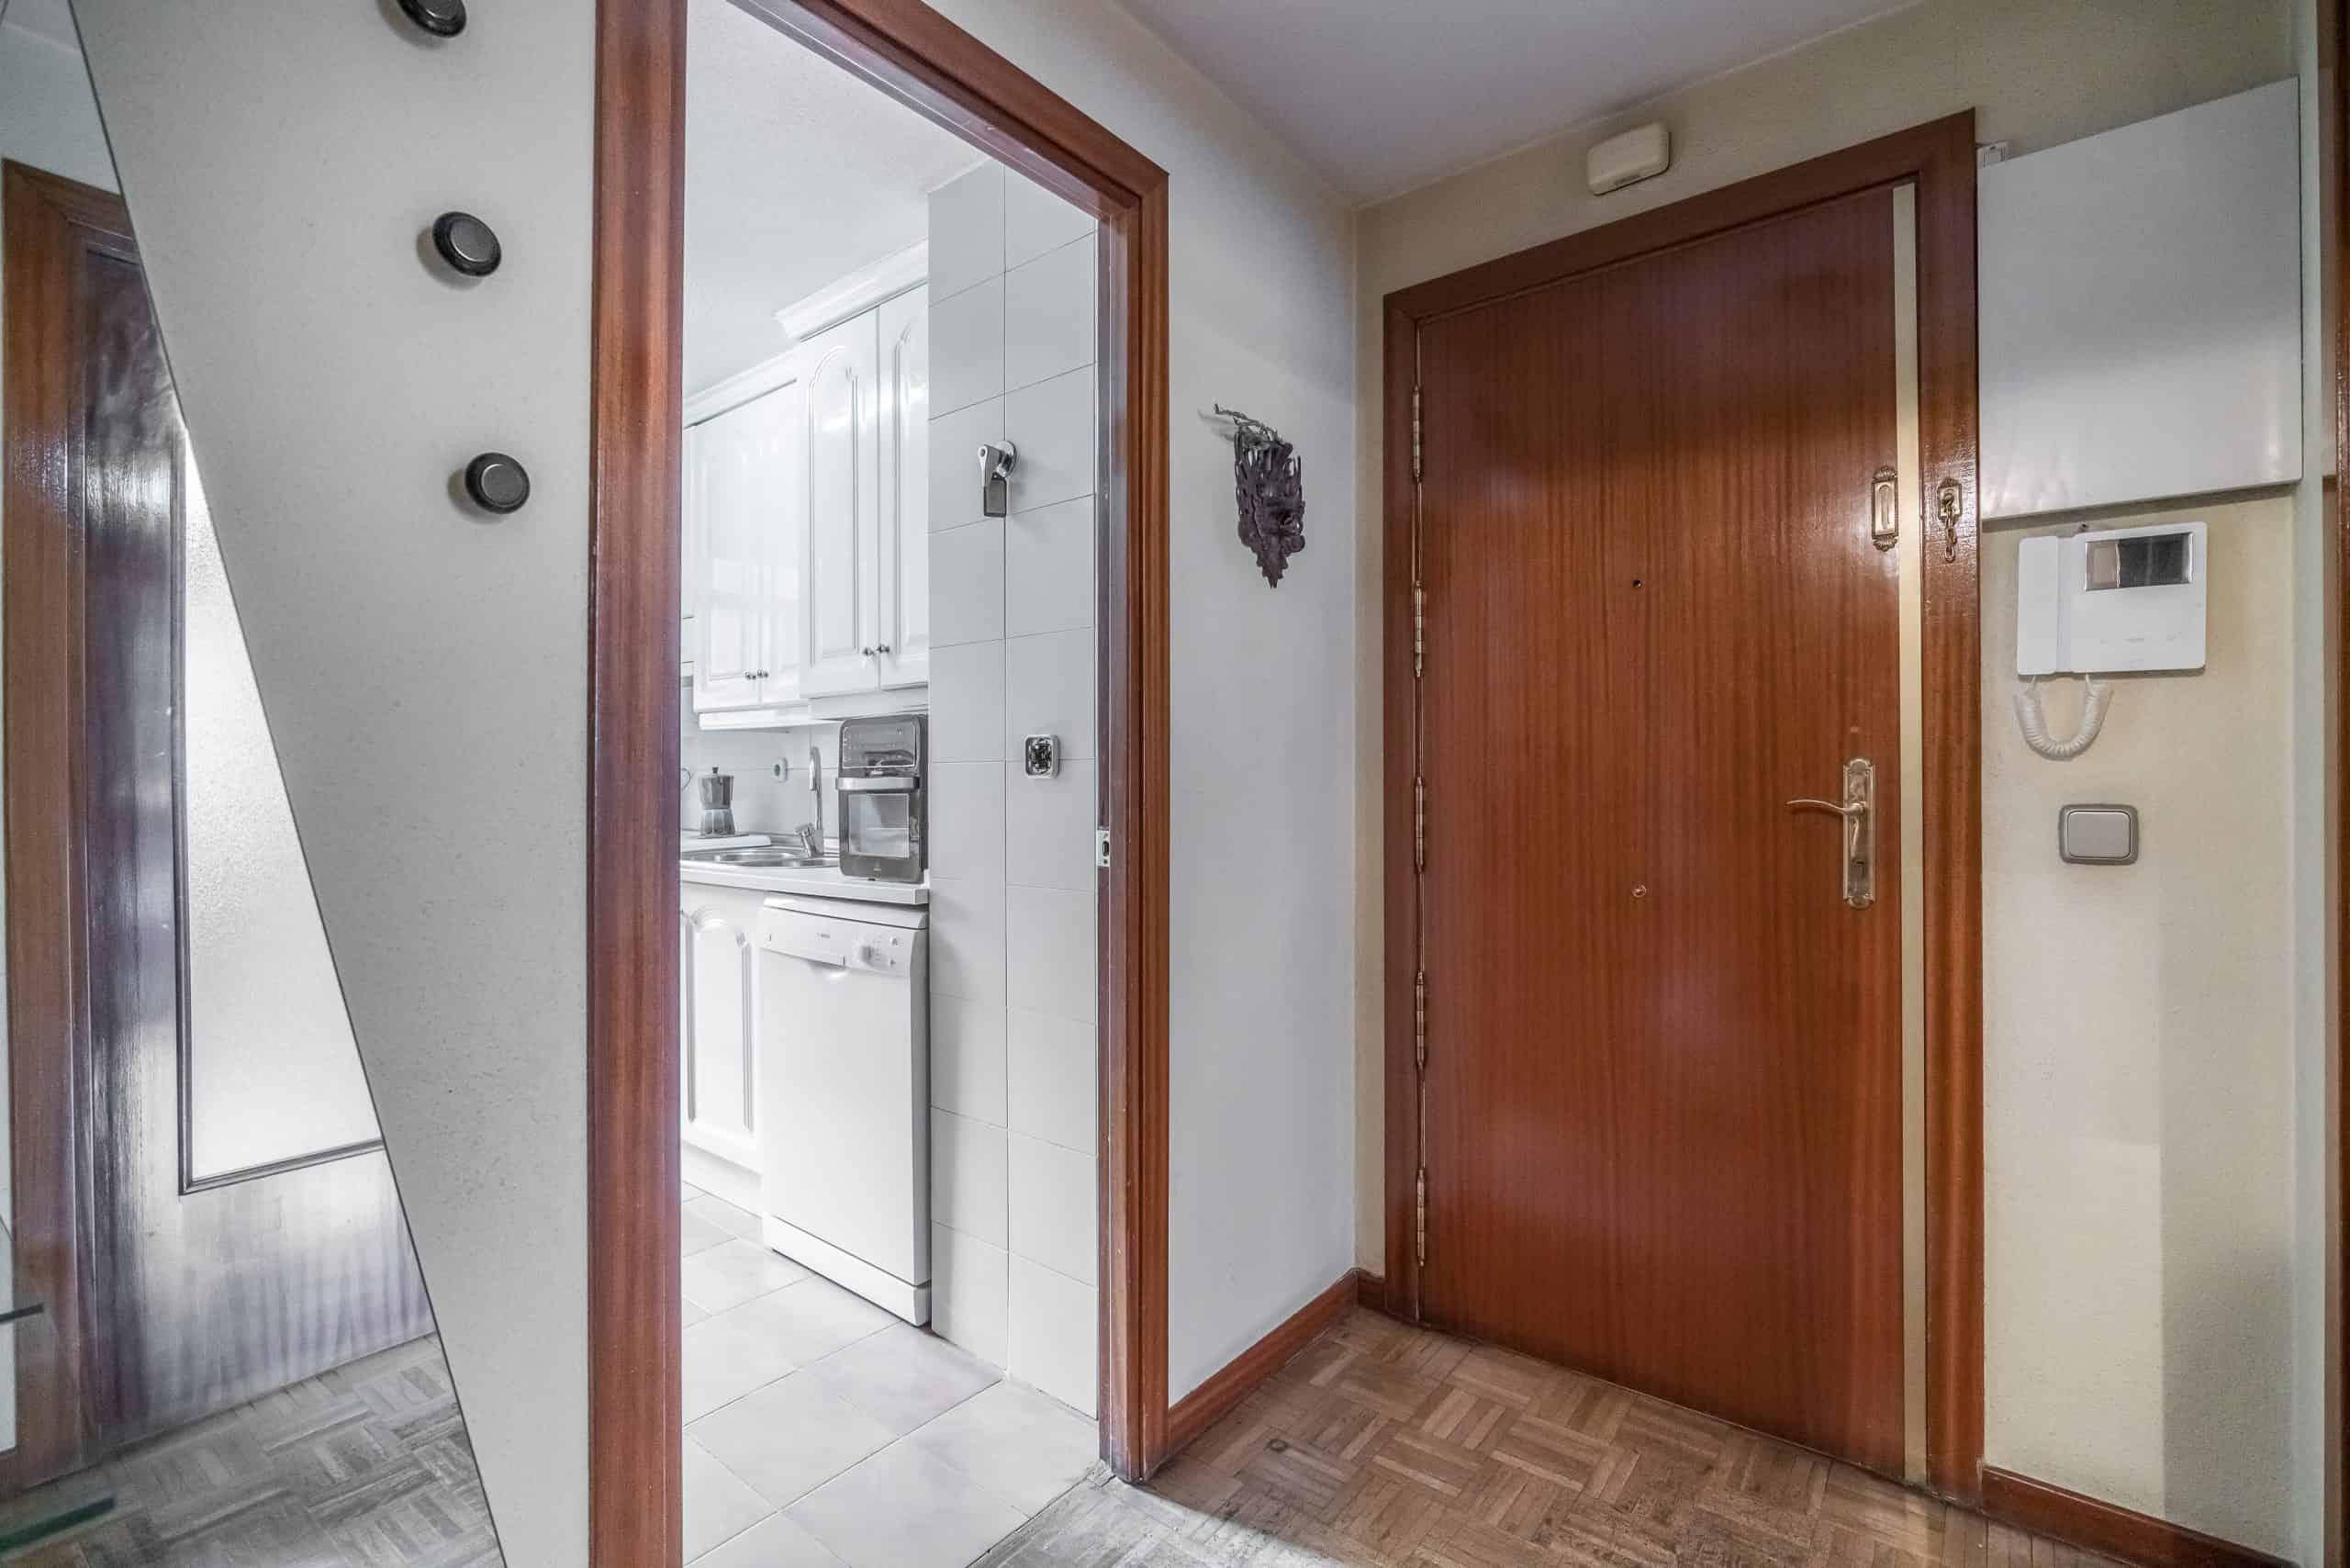 Agencia Inmobiliaria de Madrid-FUTUROCASA- ENTRADA PASILLO (1)